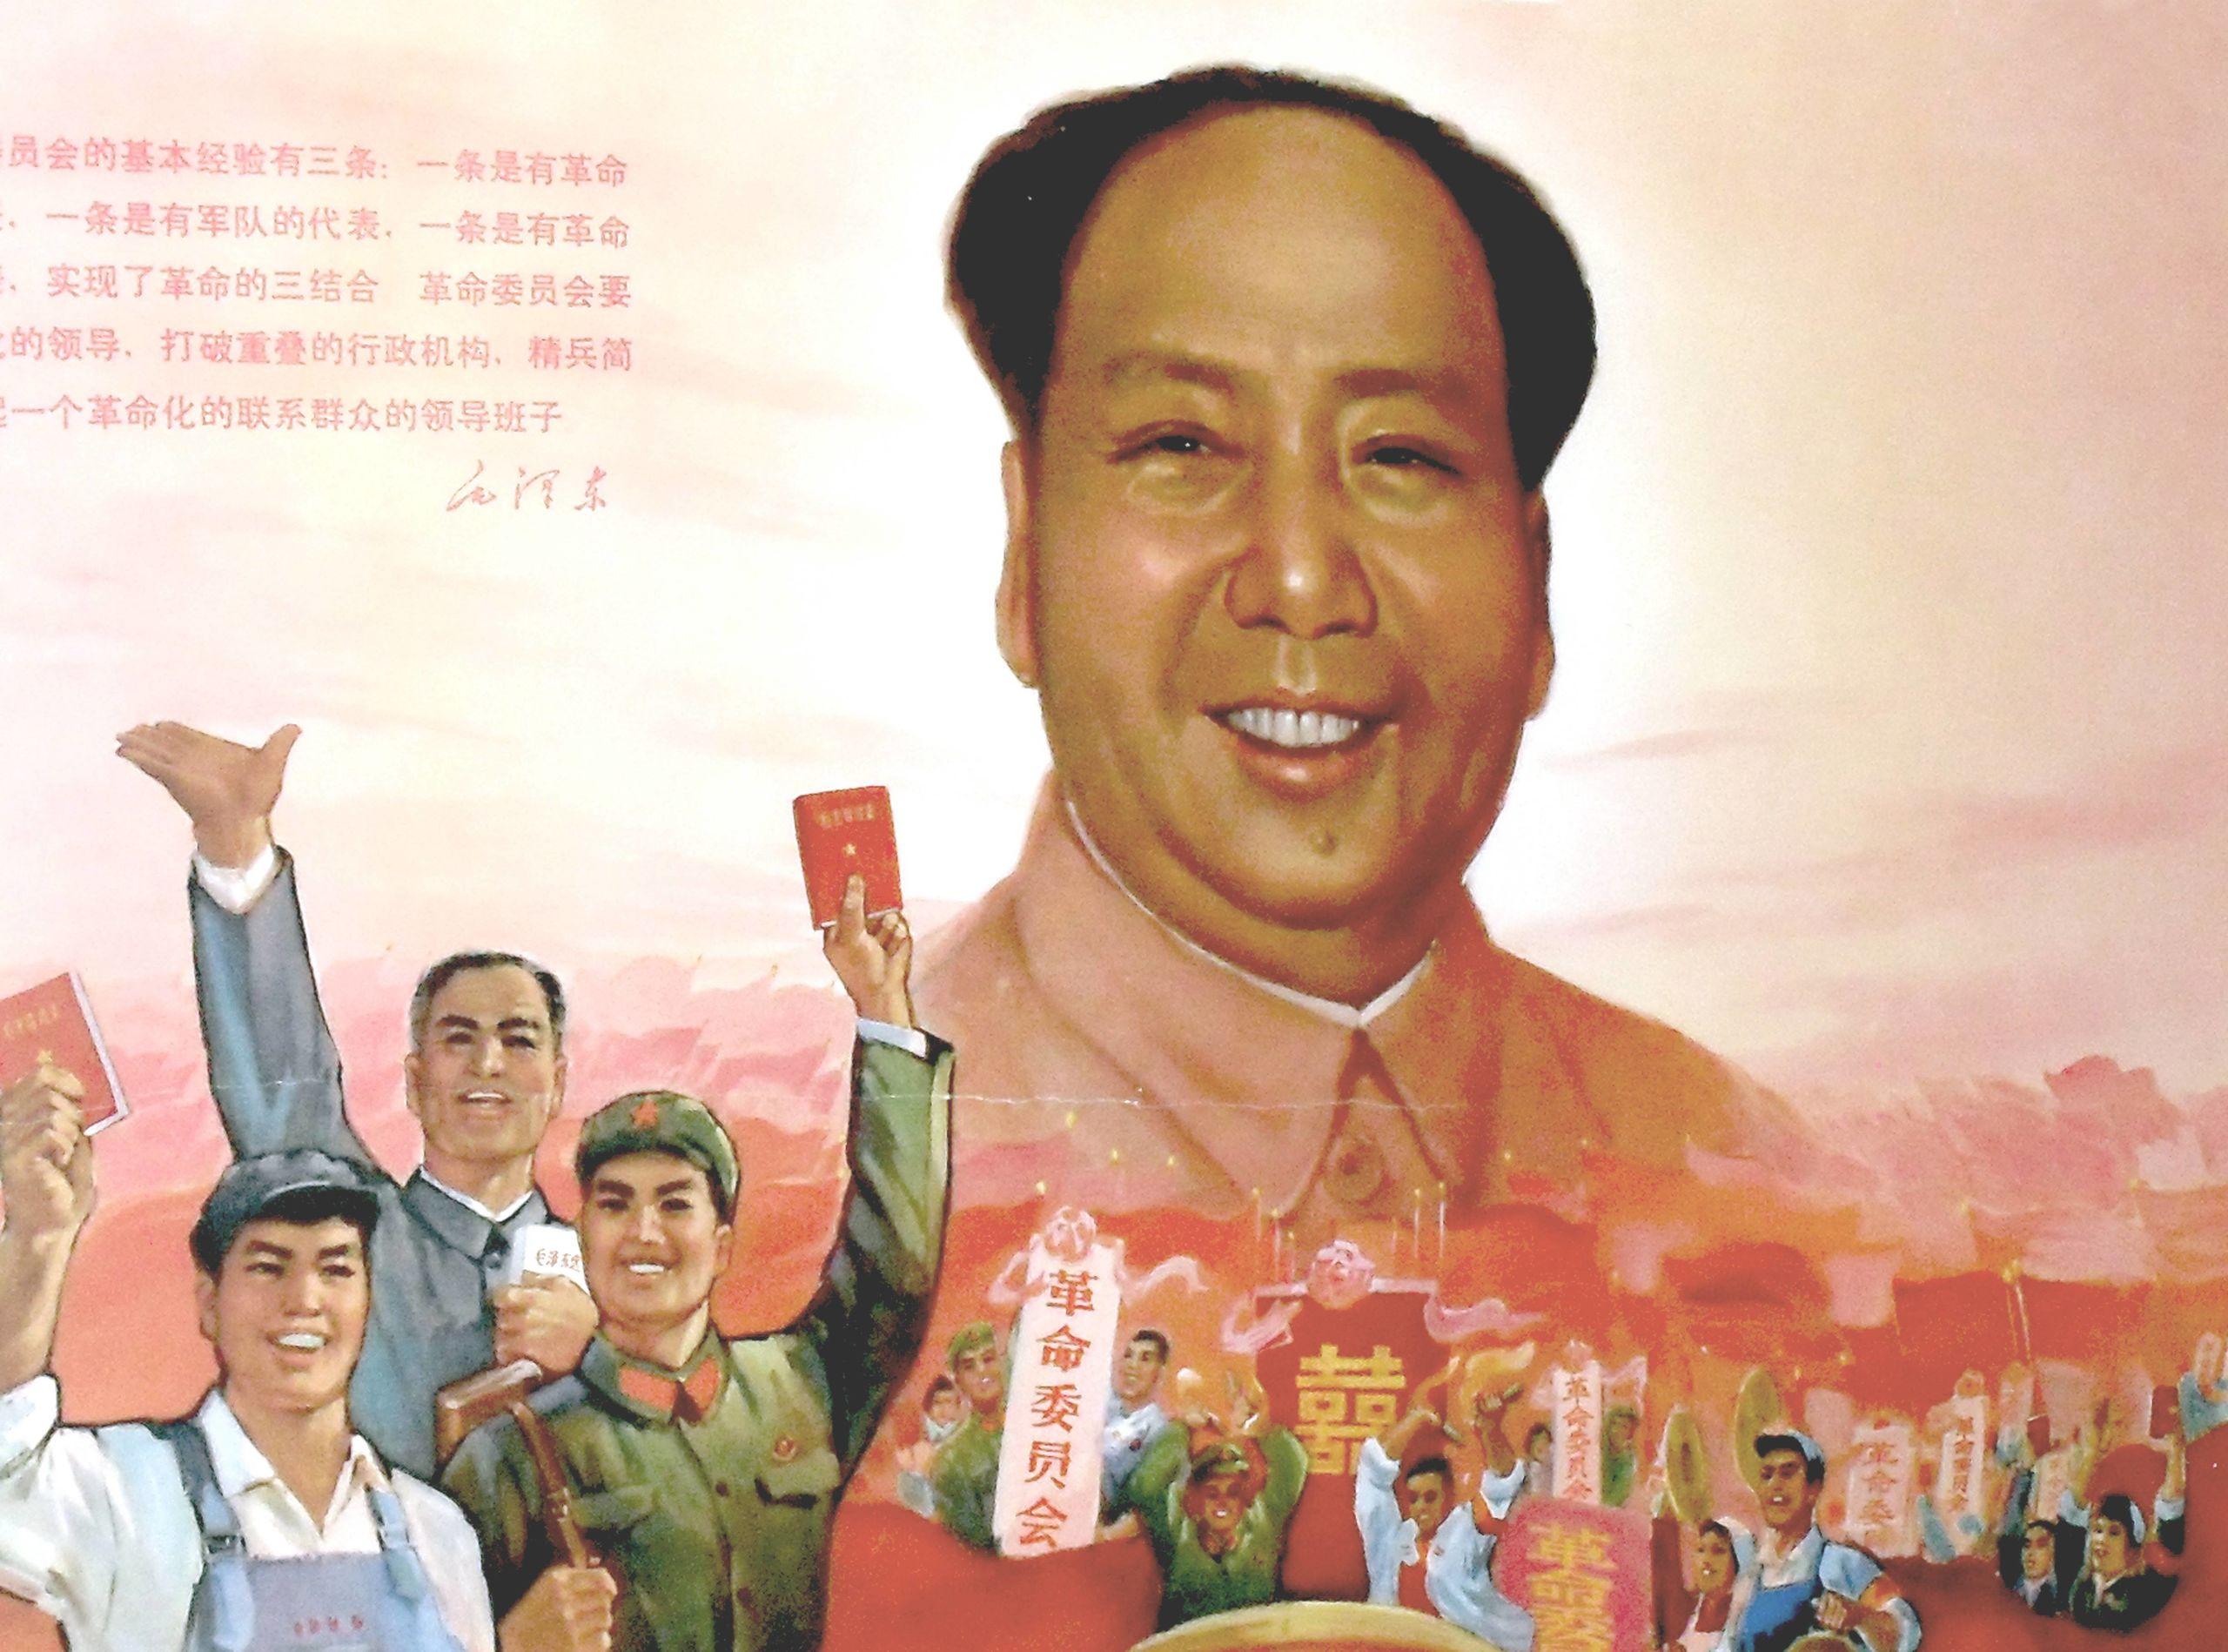 1968-cultural-revolucion-chinese.jpg